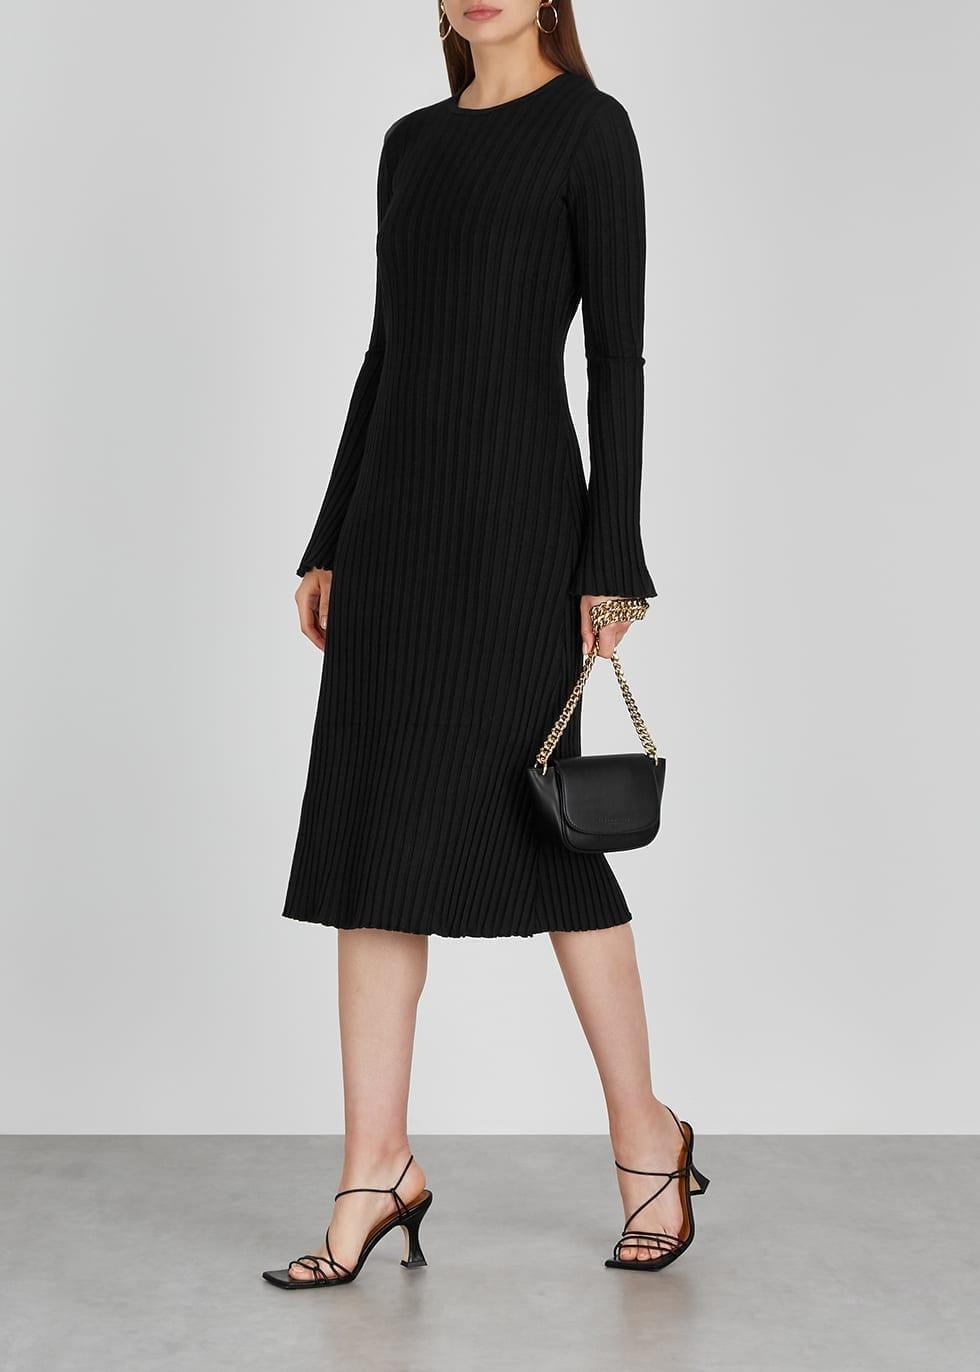 SIMON MILLER Wells Black Ribbed Jersey Midi Dress